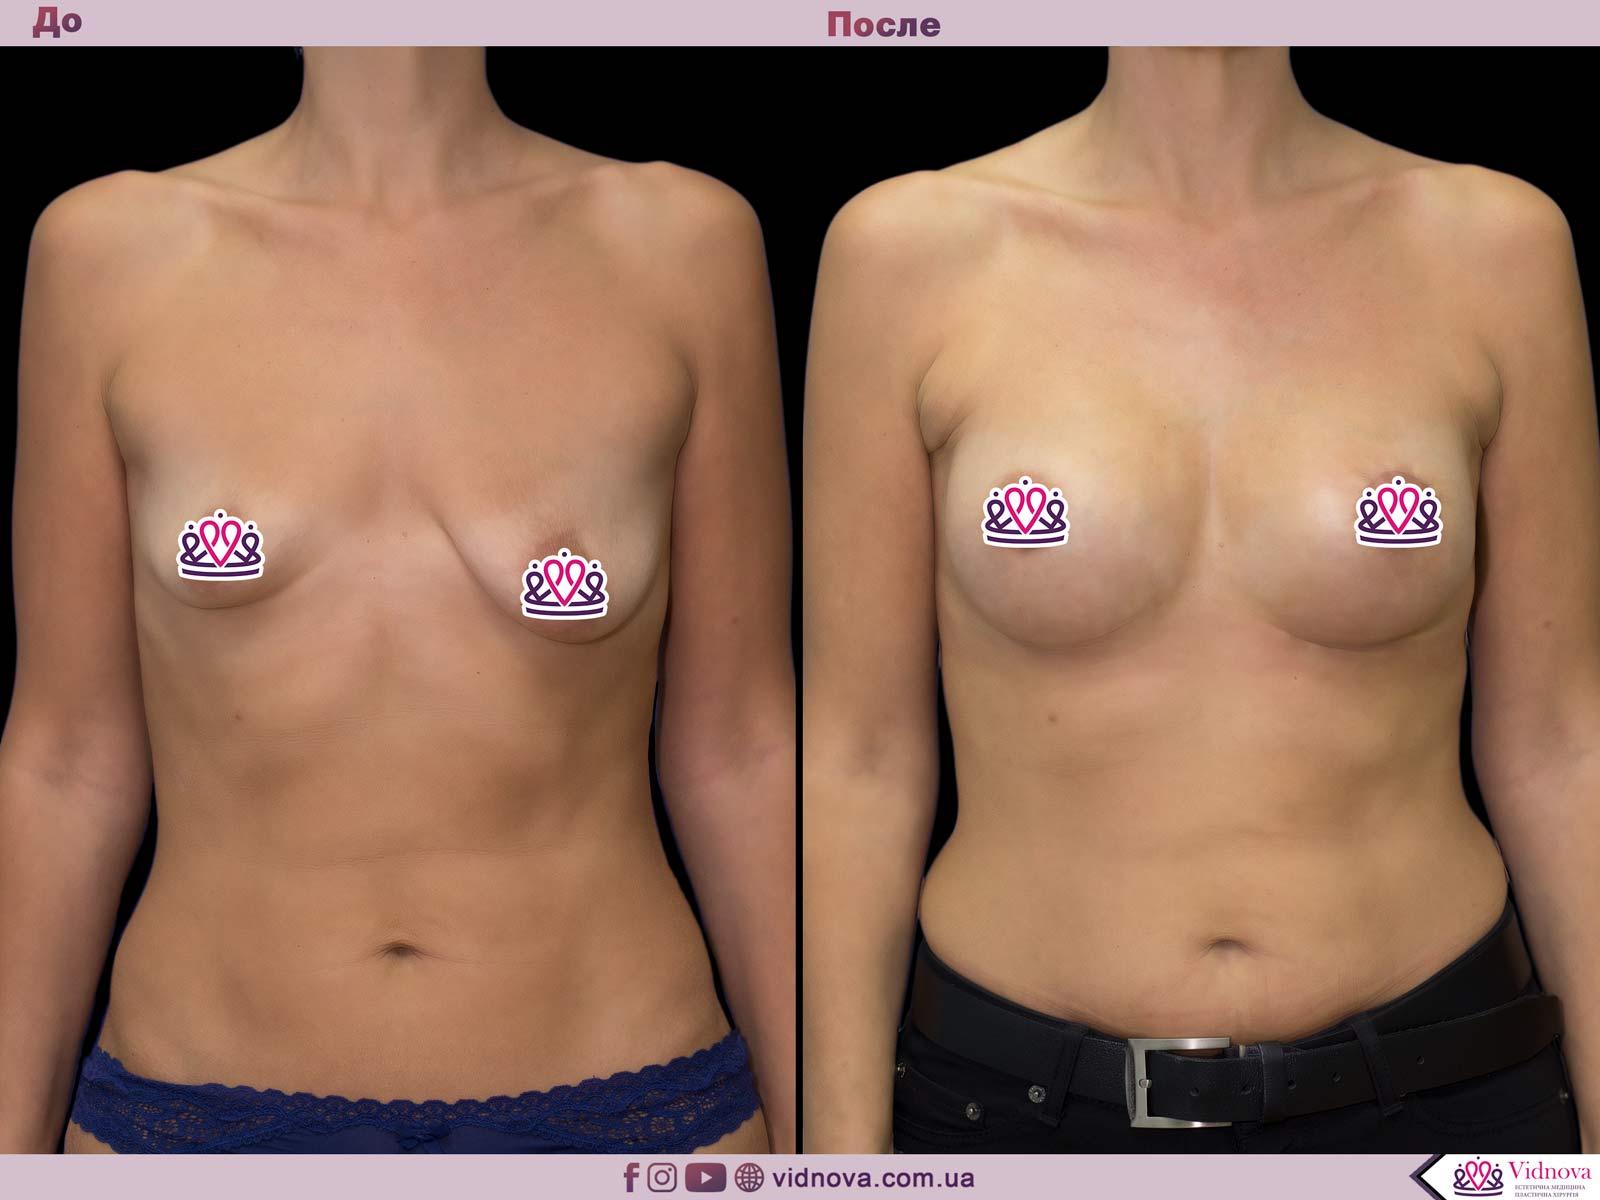 Подтяжка груди: Фото ДО и ПОСЛЕ - Пример №19-1 - Клиника Vidnova